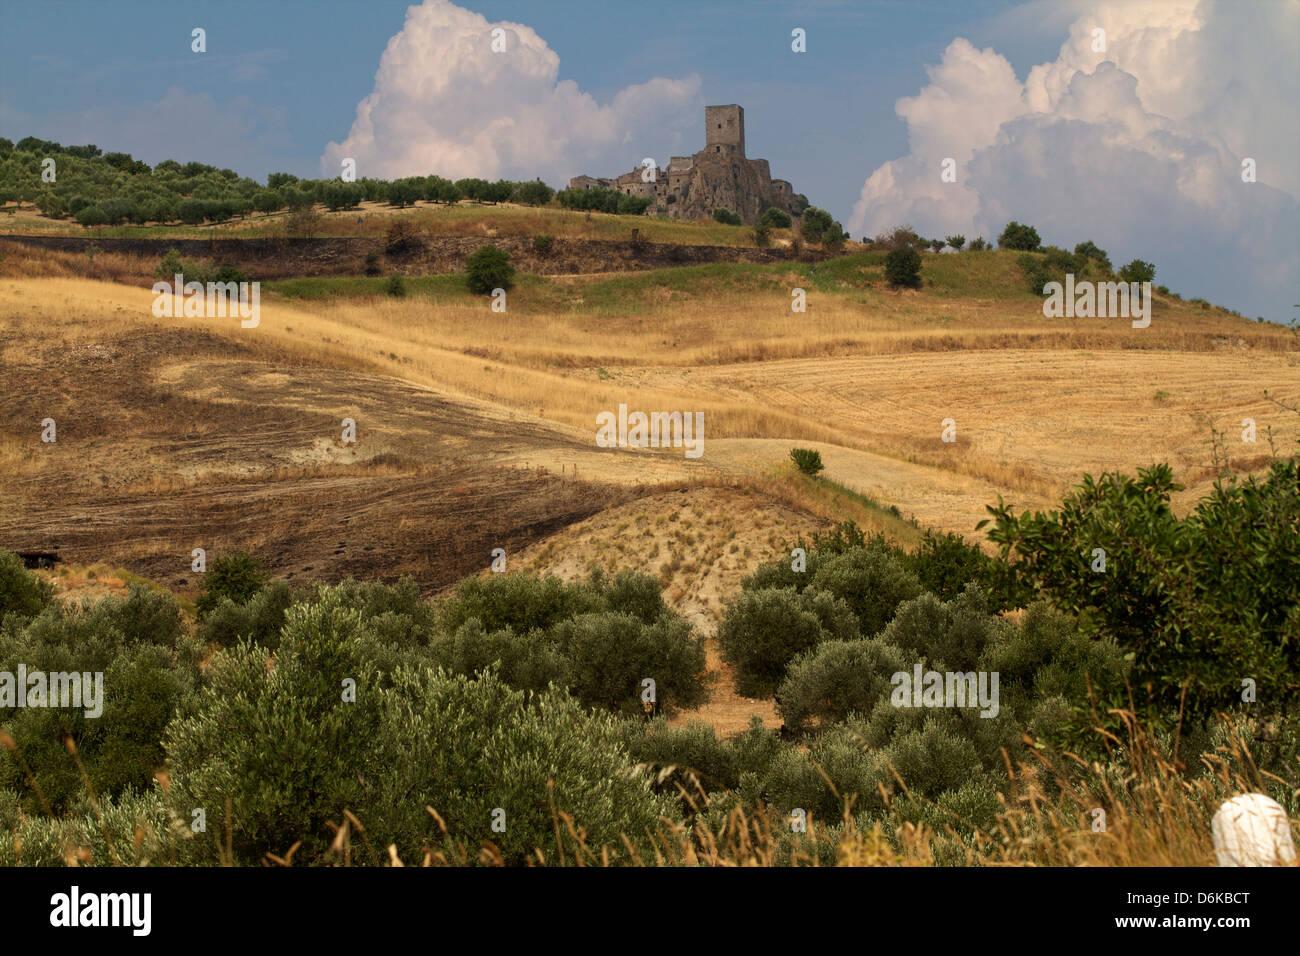 Le village abandonné de Bernalda, près de Matera, Basilicate, Italie, Europe Photo Stock